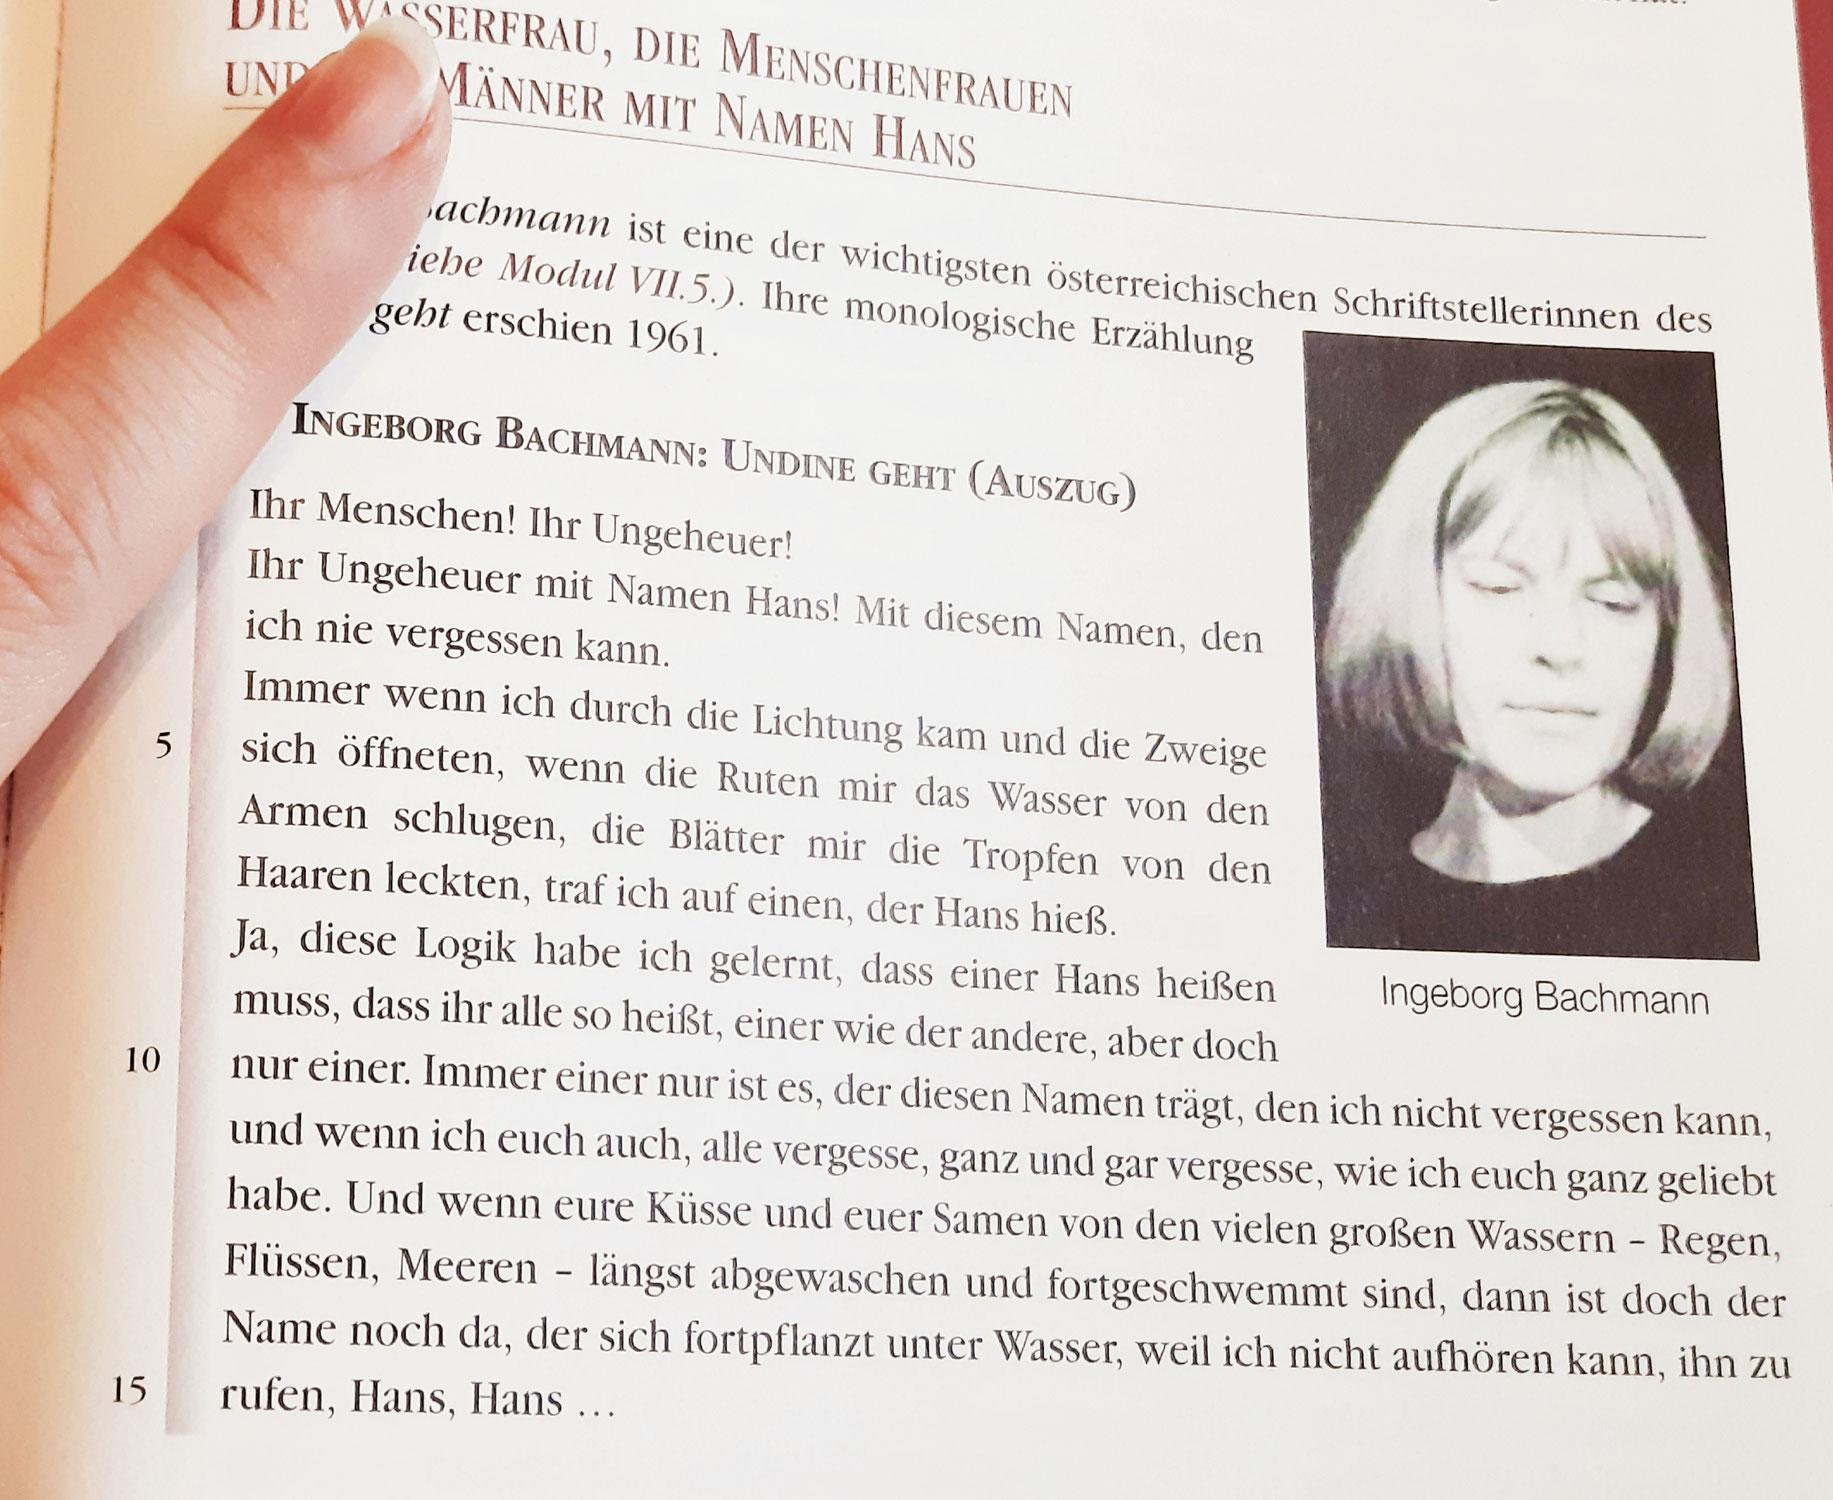 Ingeborg Bachmann - 95. Geburtstag